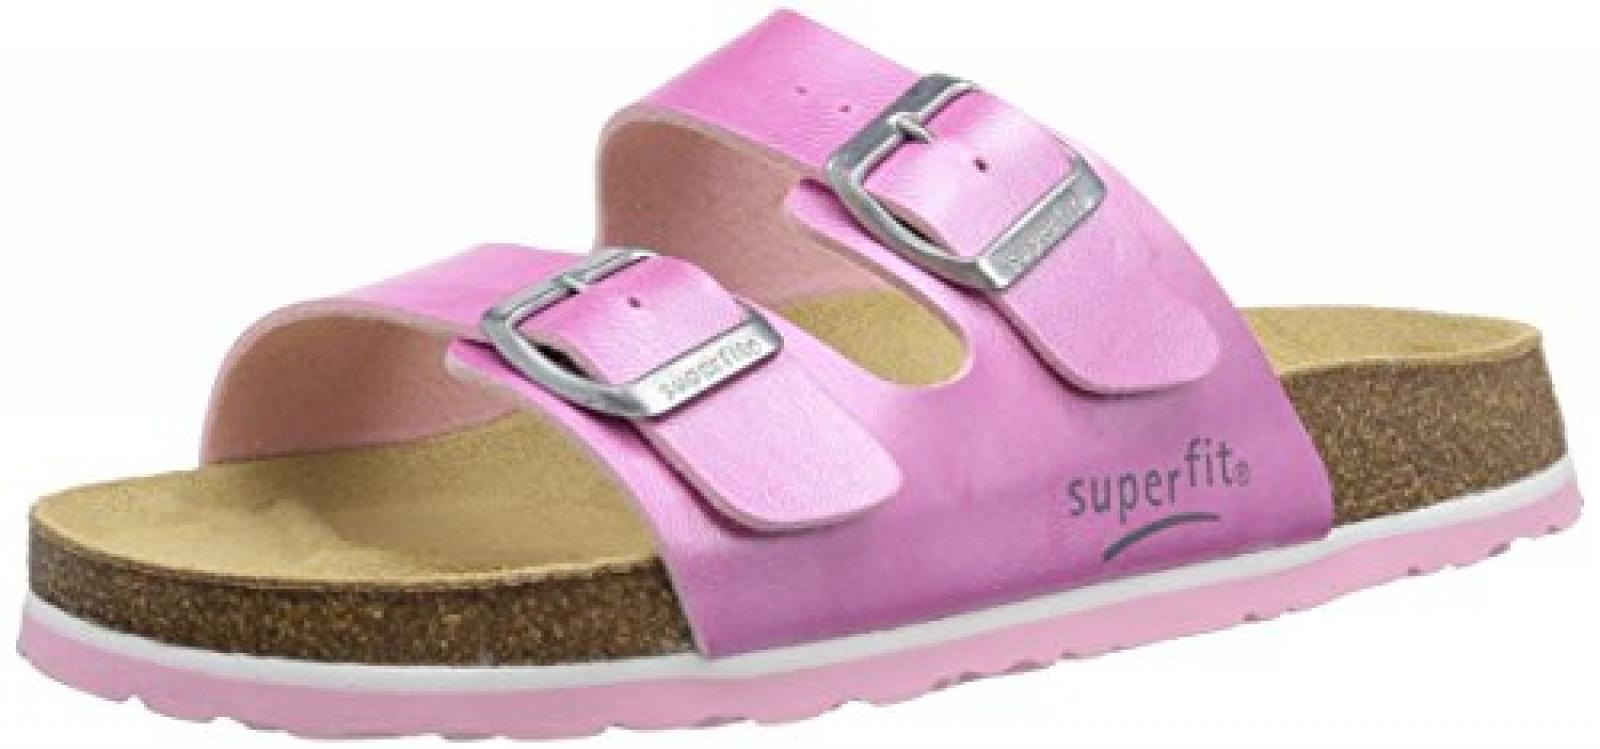 Superfit FUSSBETTPANTOFFEL 400111 Mädchen Pantoffeln